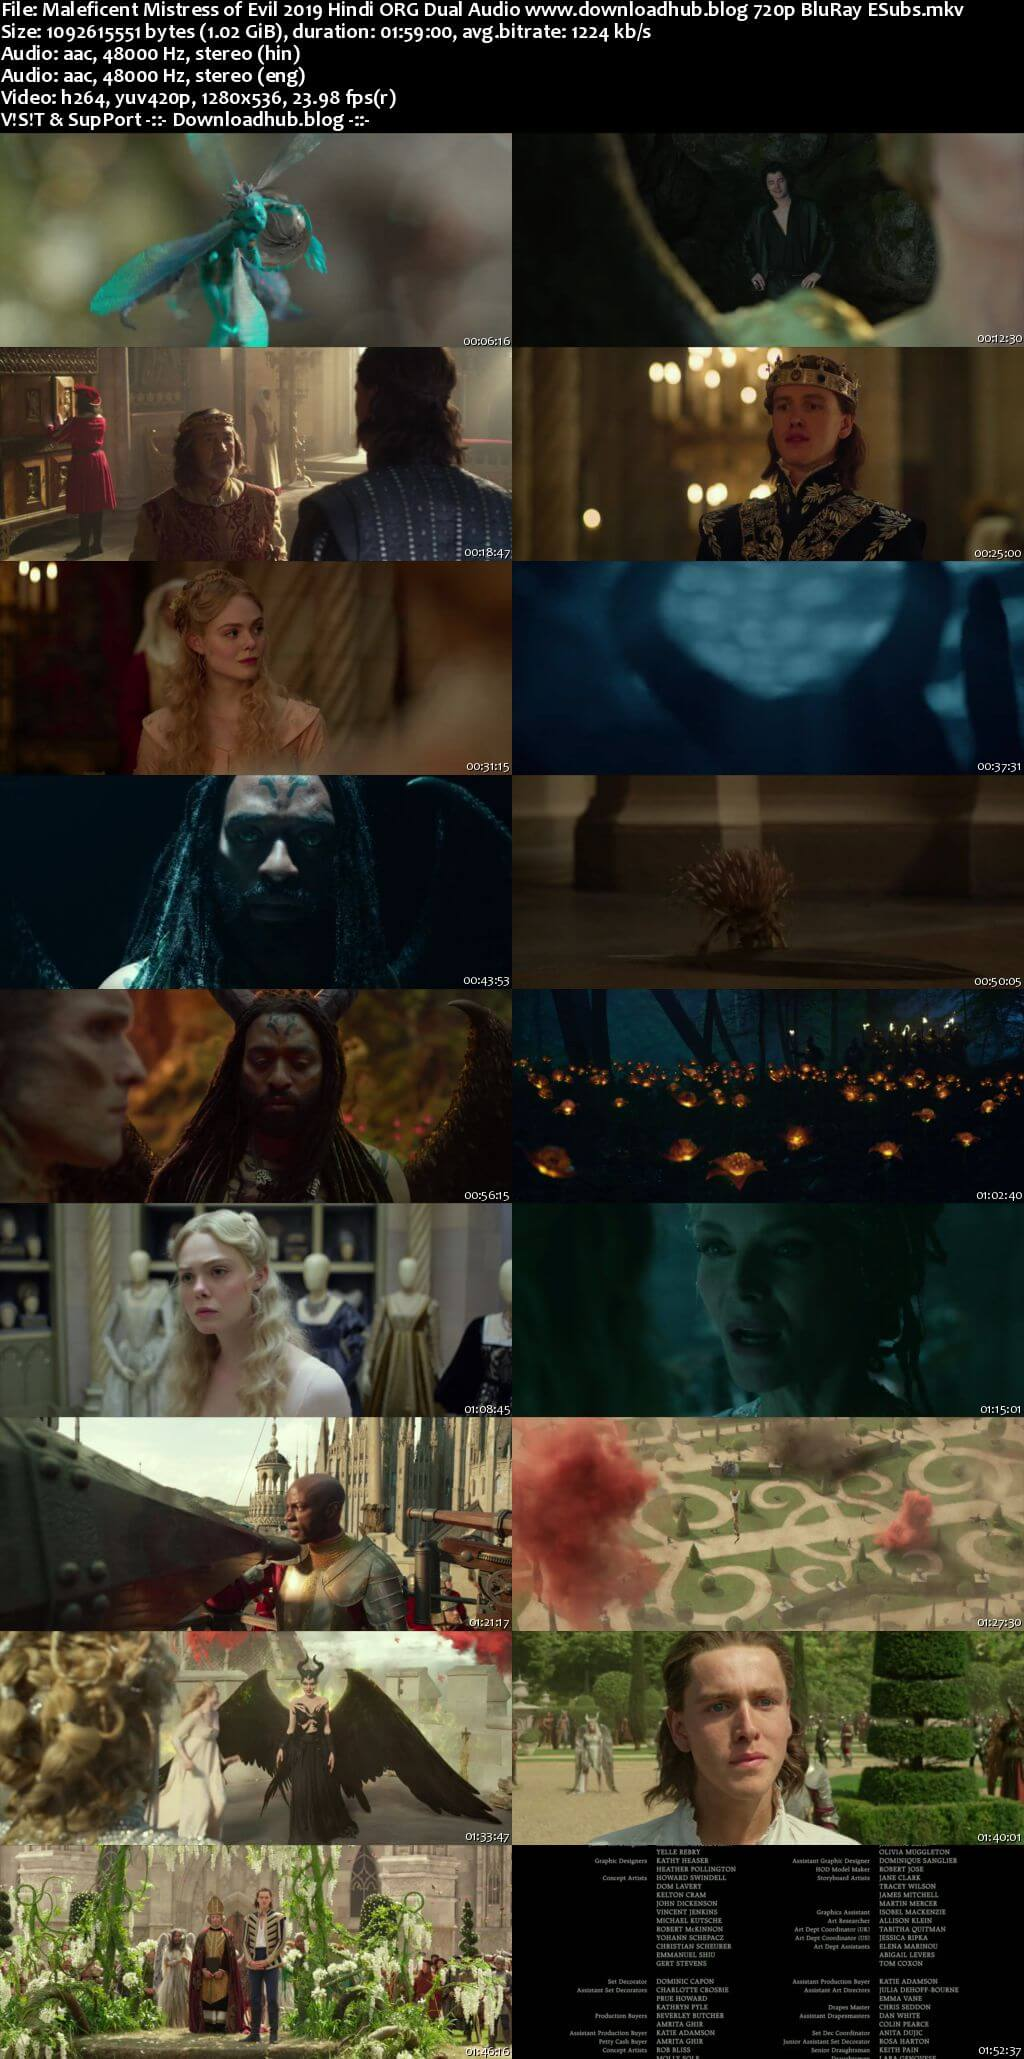 Maleficent Mistress of Evil 2019 Hindi ORG Dual Audio 720p BluRay ESubs